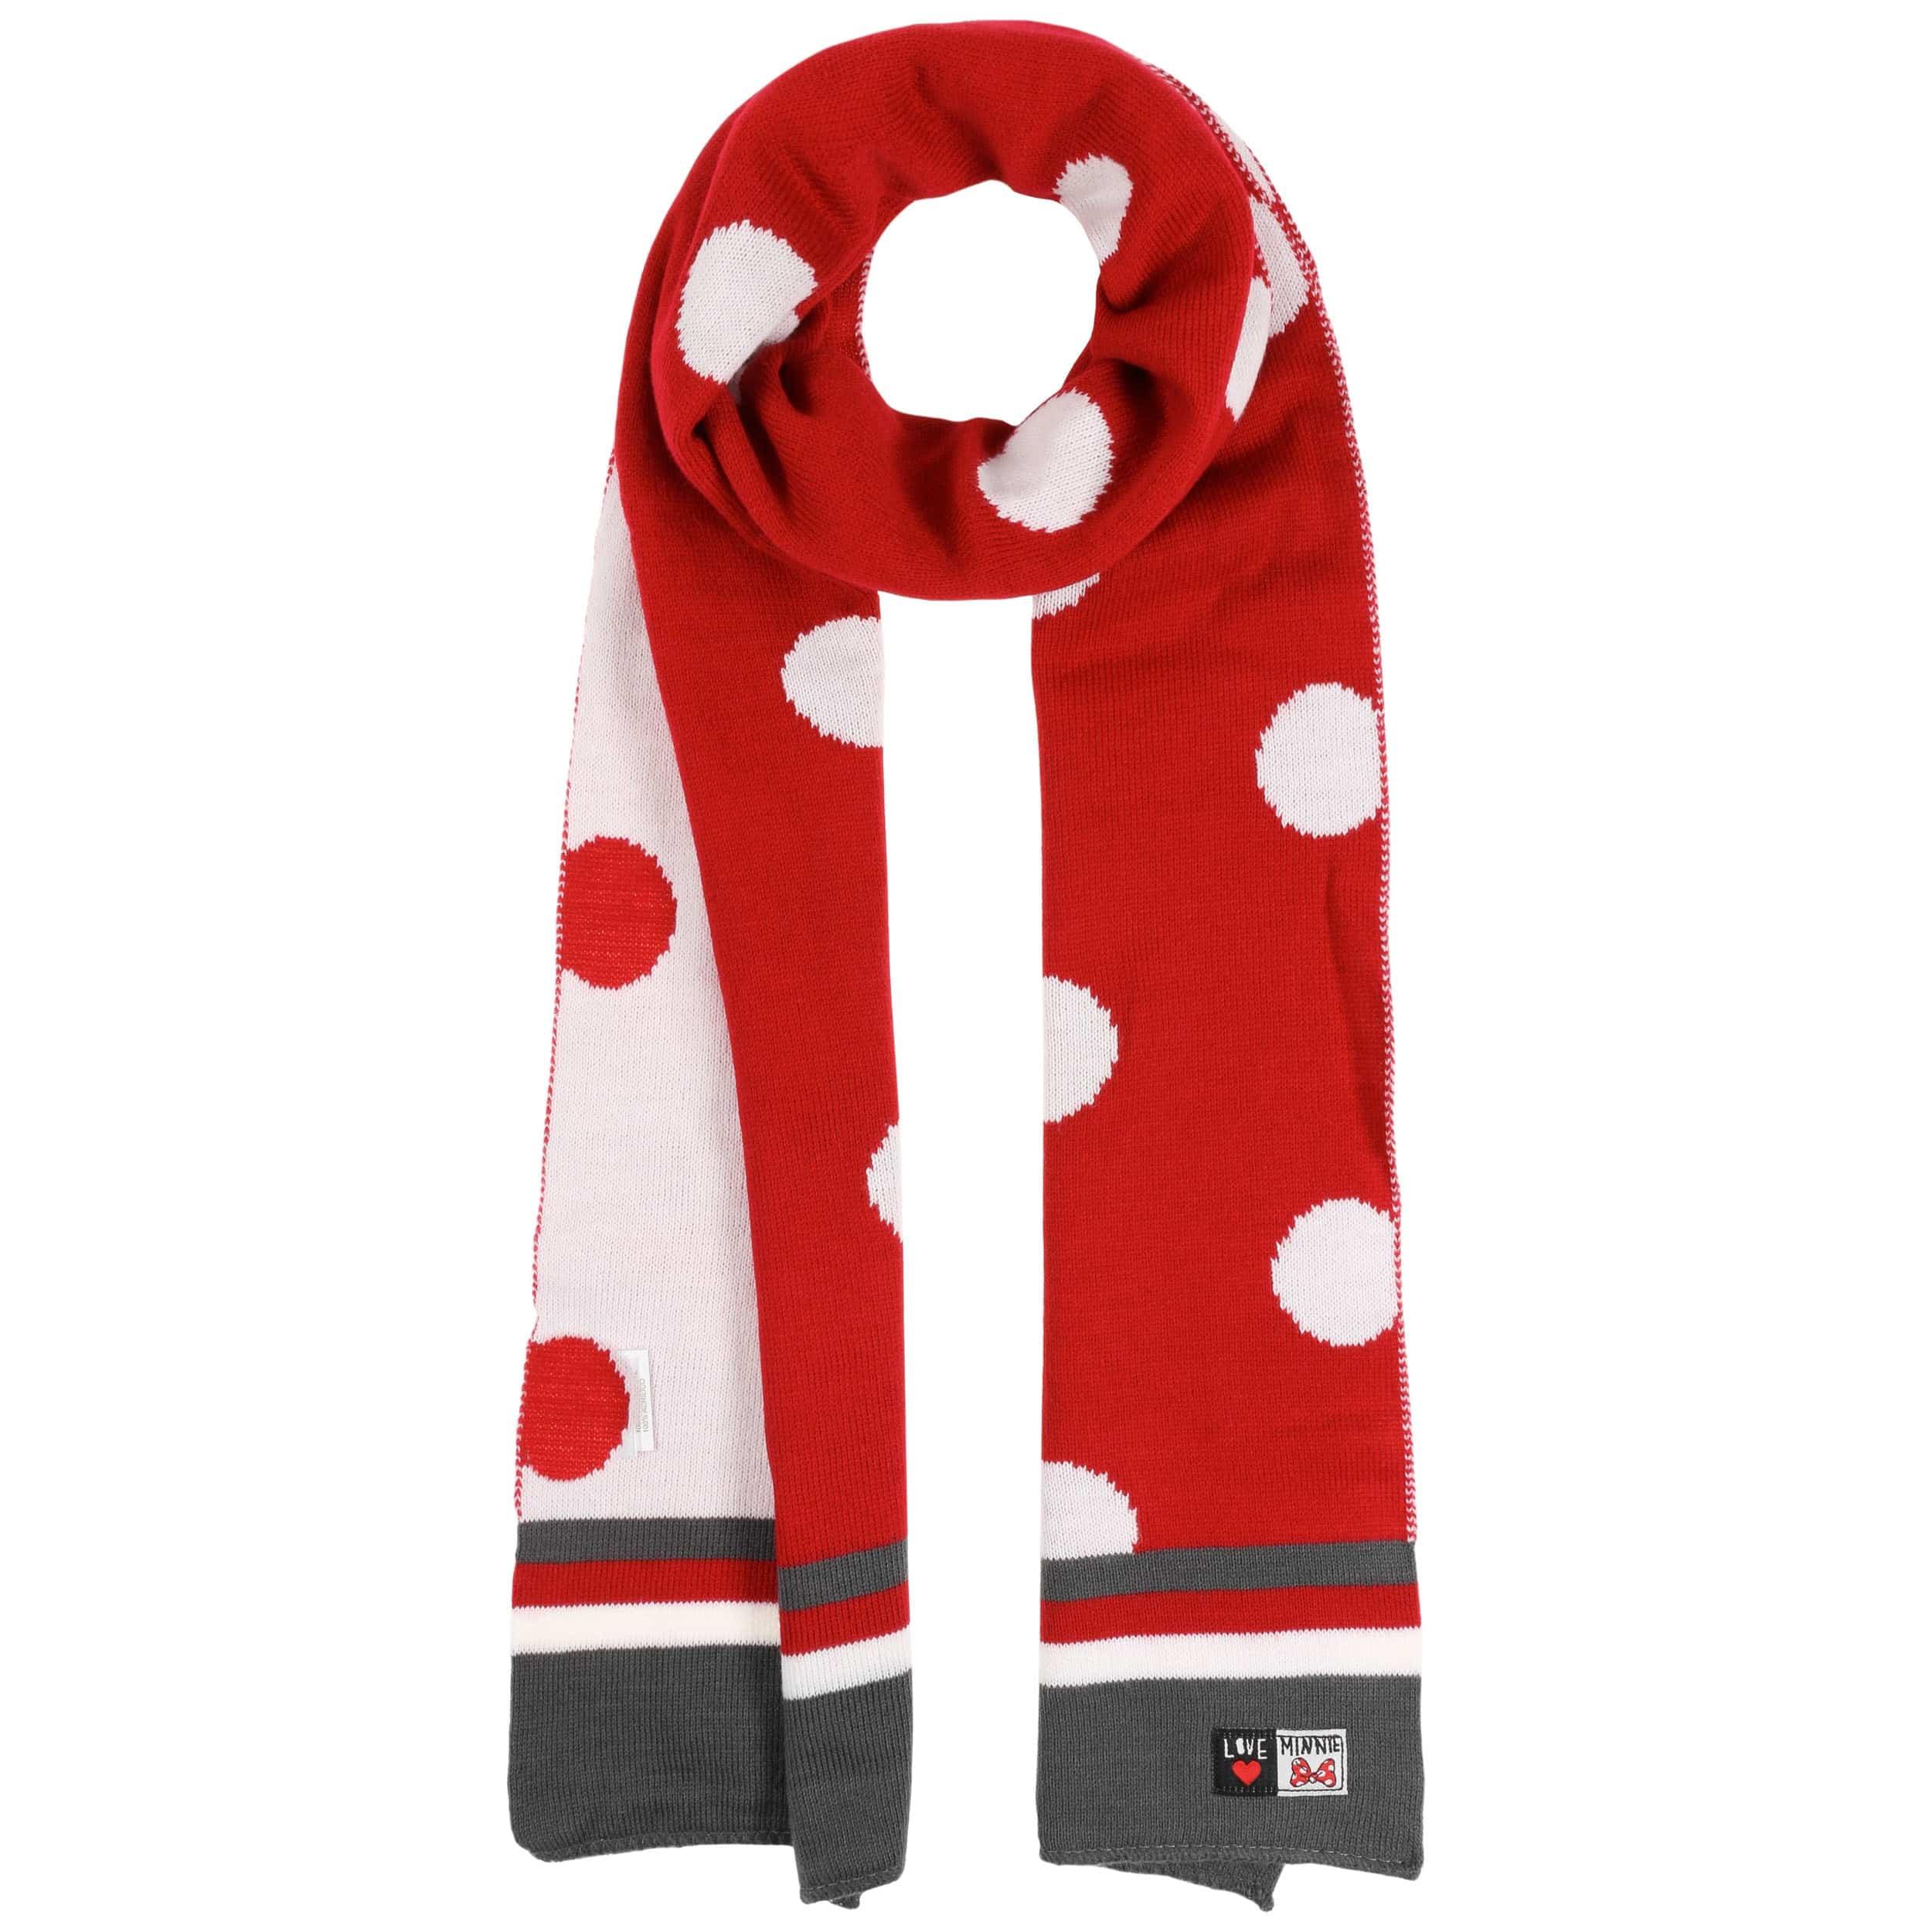 de33dcce78f Minnie mouse beanie scarf eur hats caps beanies shop jpg 2500x2500 Minnie  mouse scarf set